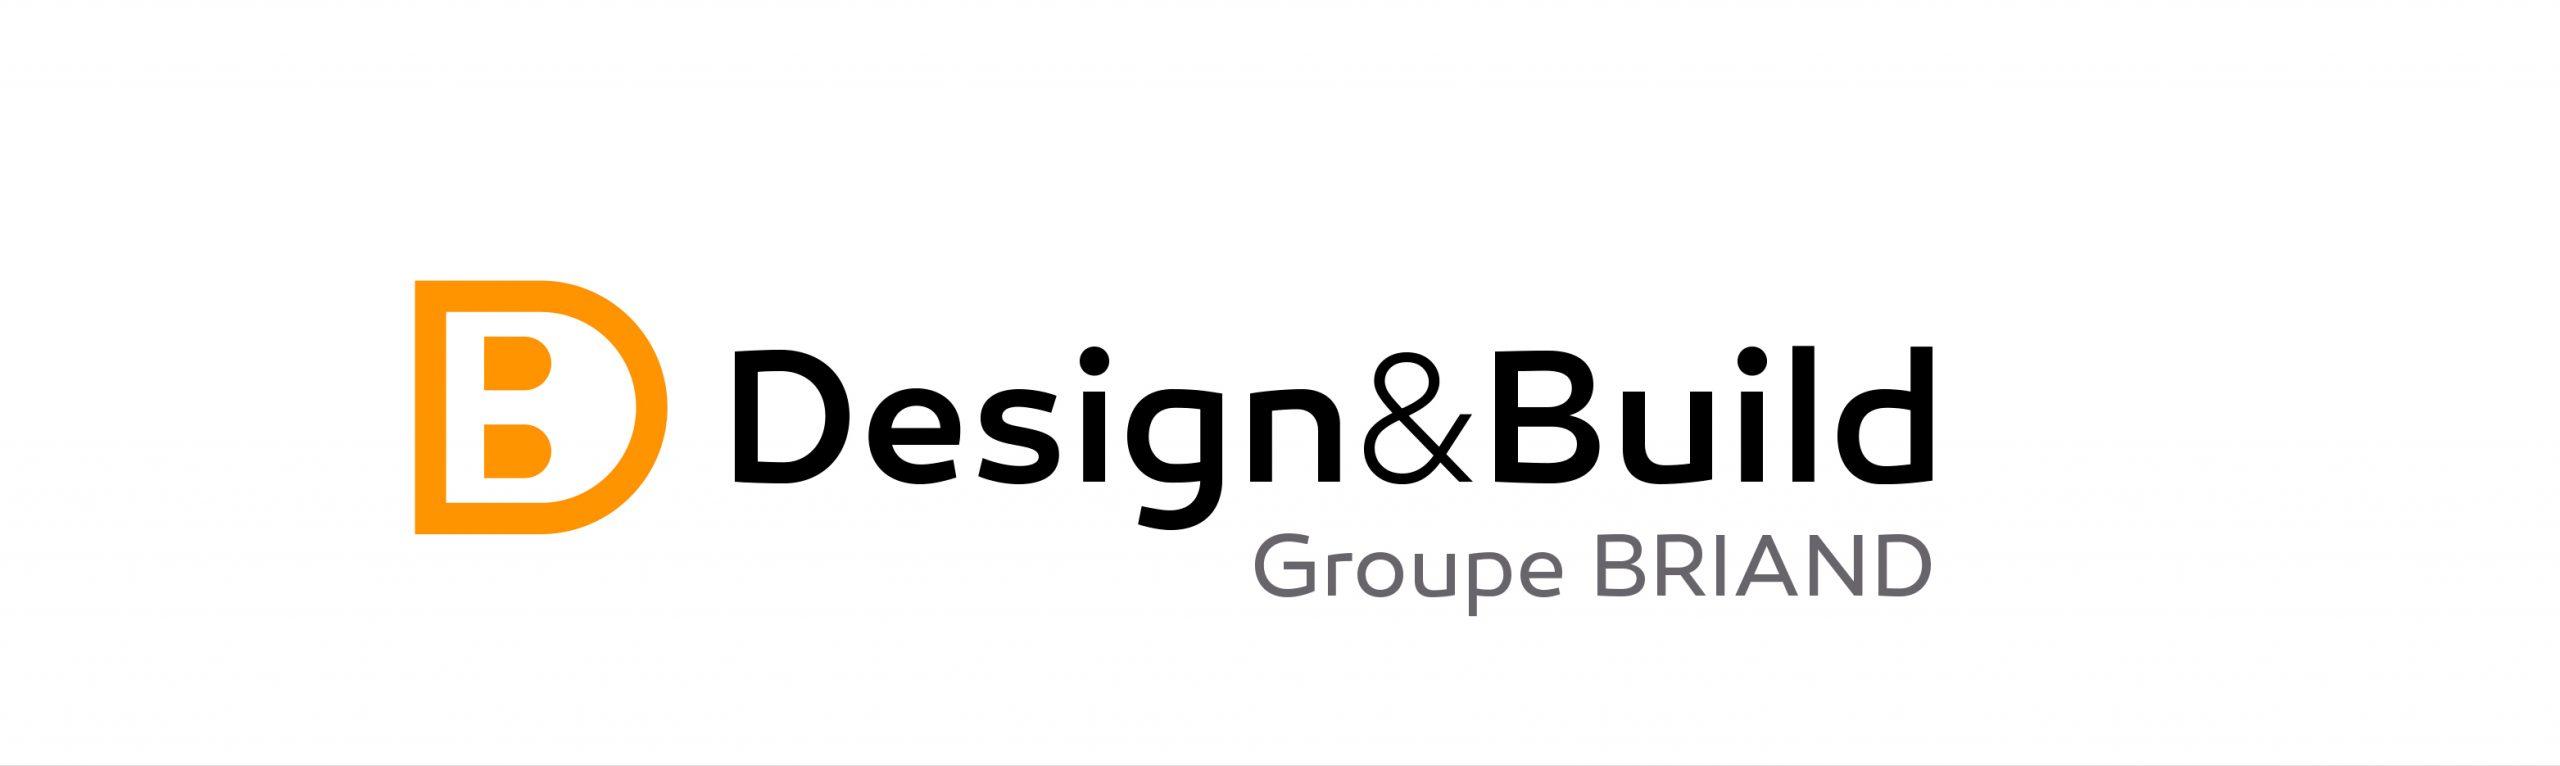 Logo Design & Build - Groupe Briand